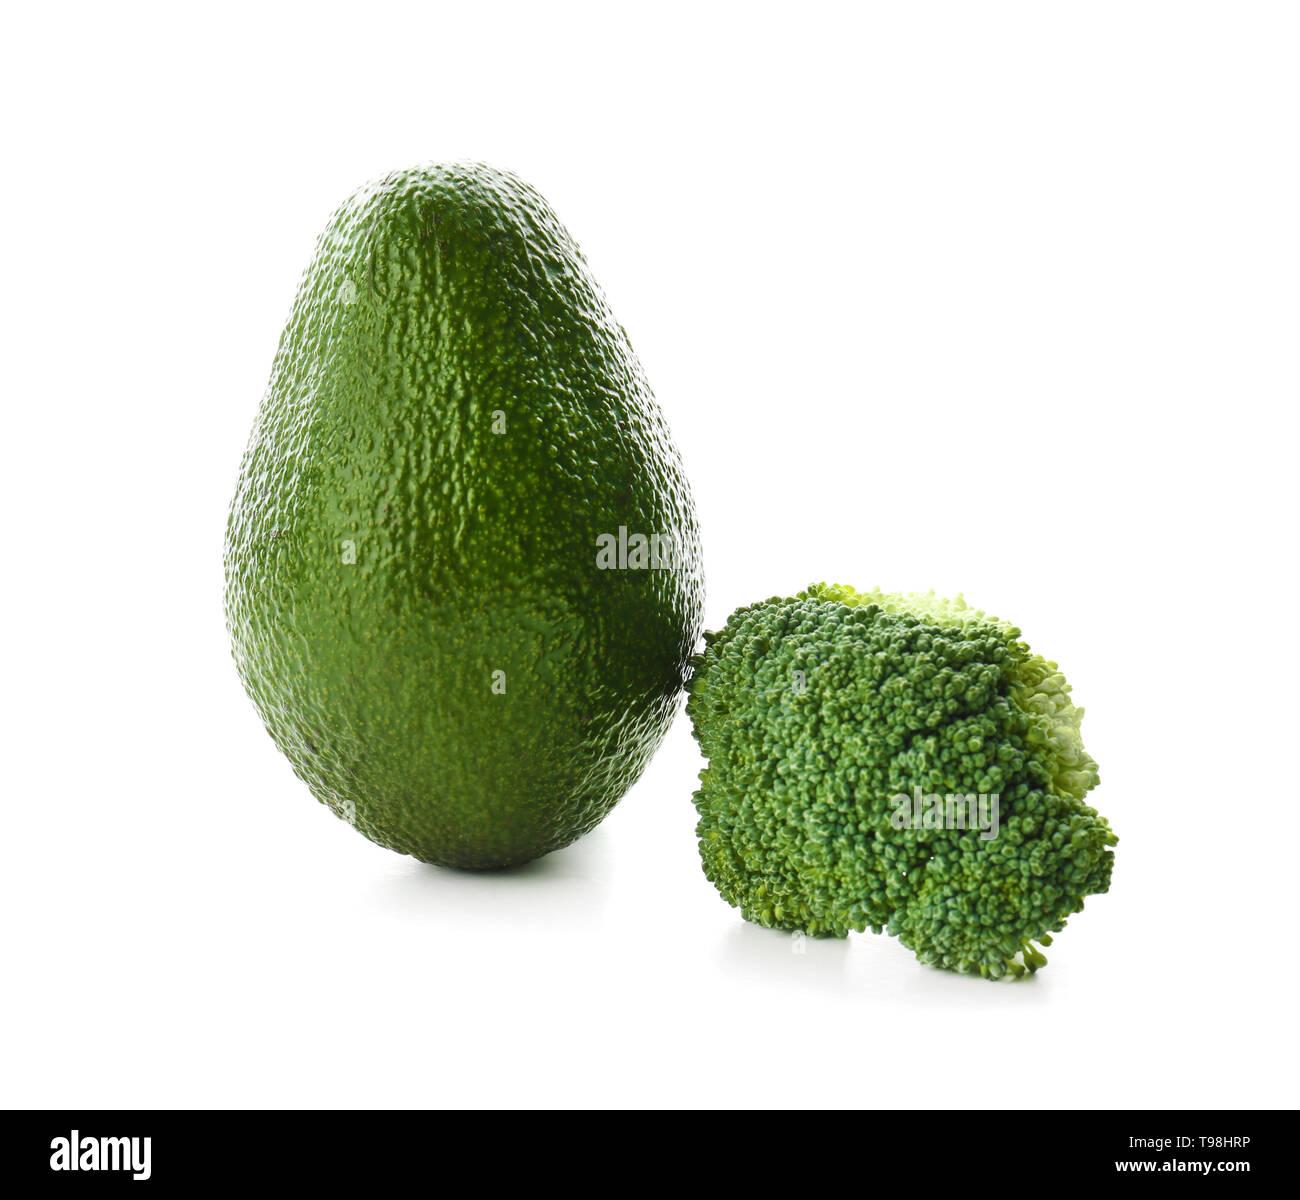 Ripe avocado and broccoli on white background - Stock Image